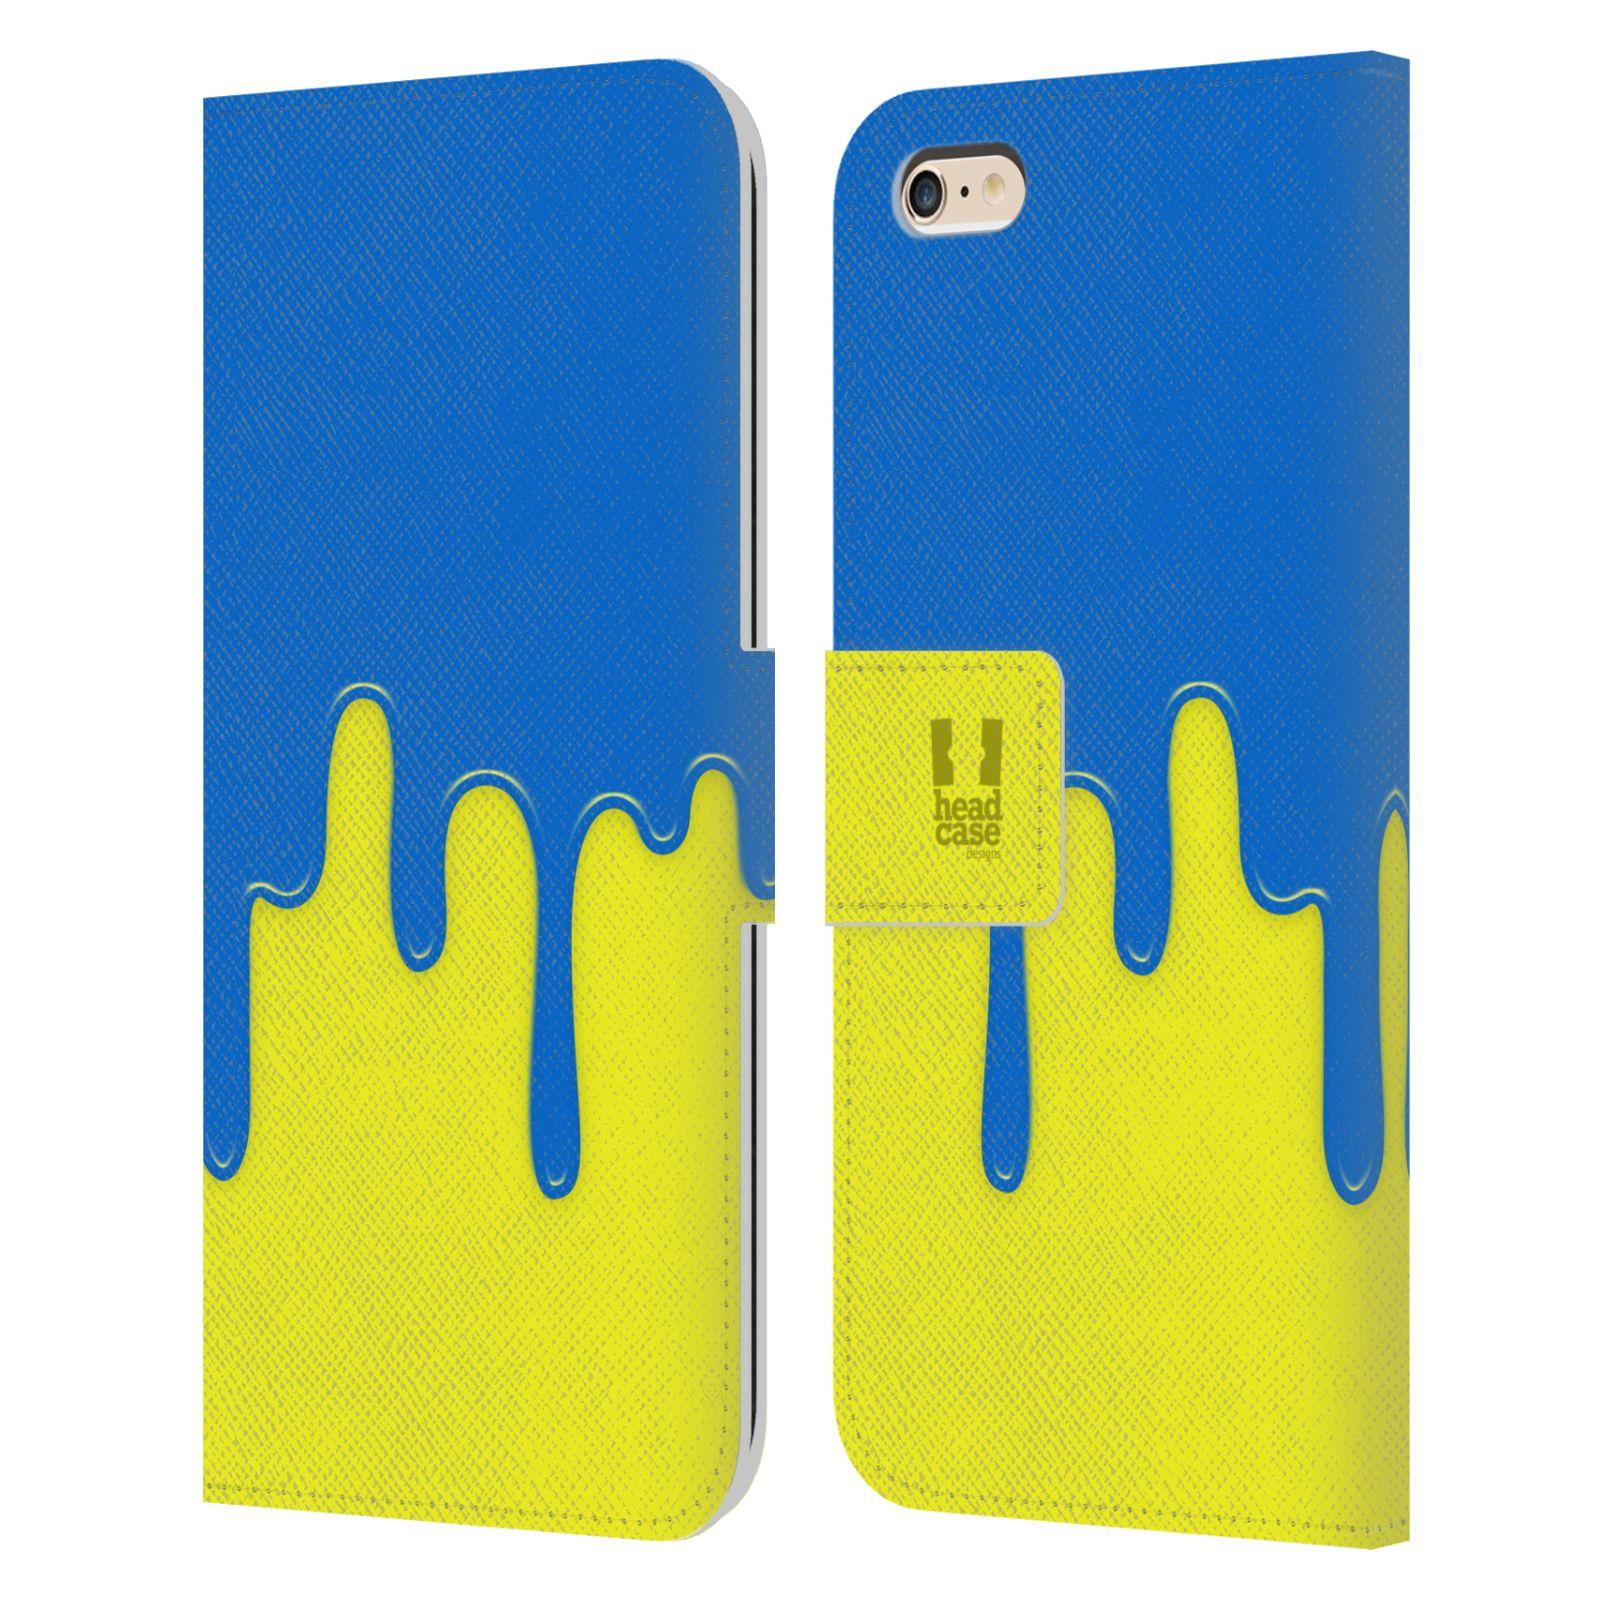 HEAD CASE Flipové pouzdro pro mobil Apple Iphone 6 PLUS / 6S PLUS Rozlitá barva modrá a žlutá